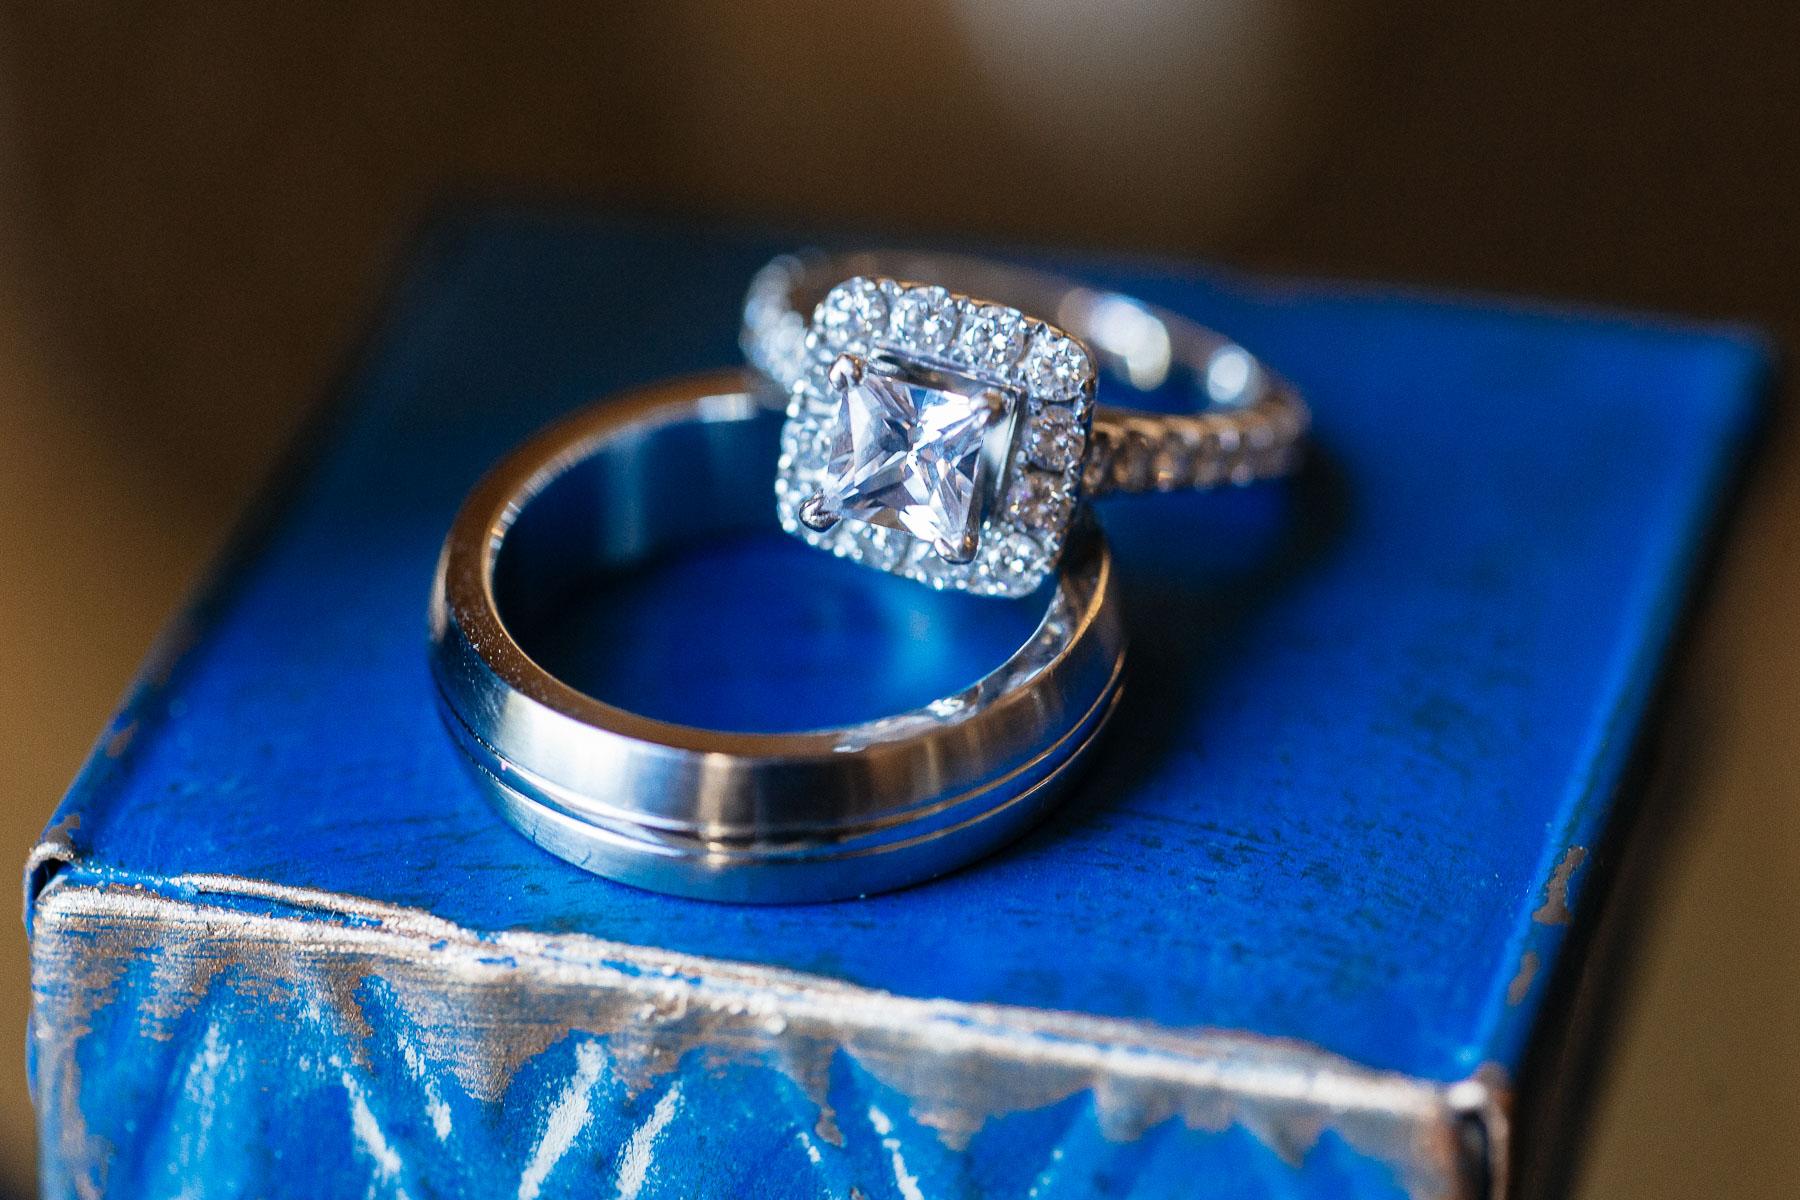 161029-Luxium-Weddings-Arizona-Jeff-Griselda-First-Look-Val-Vista-Lakes-Gilber-009.jpg